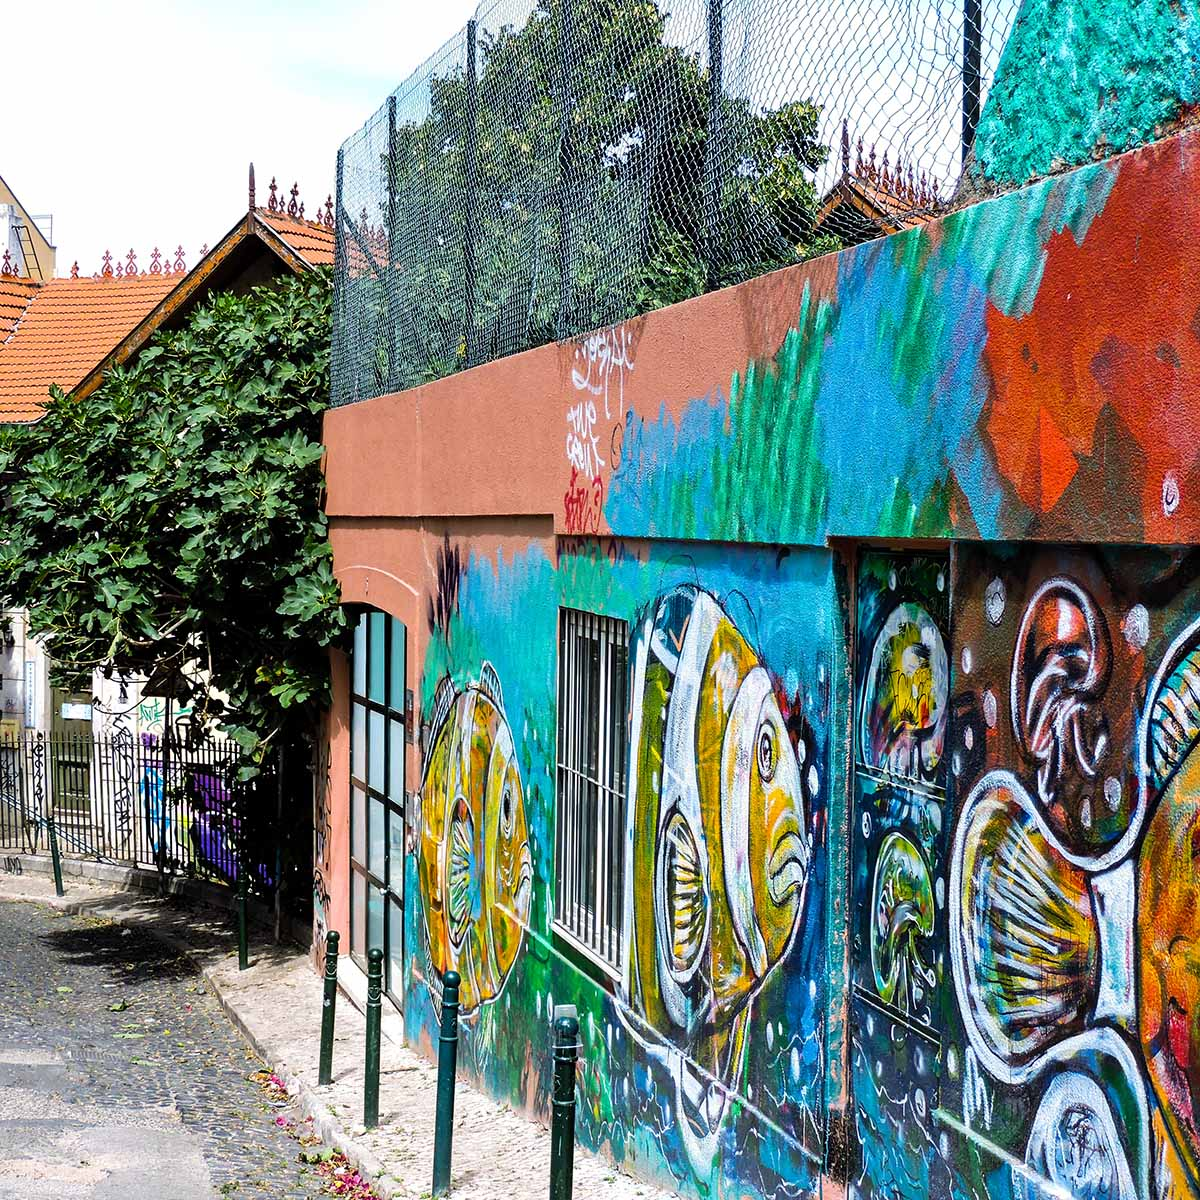 Colorful Bairro Alto street